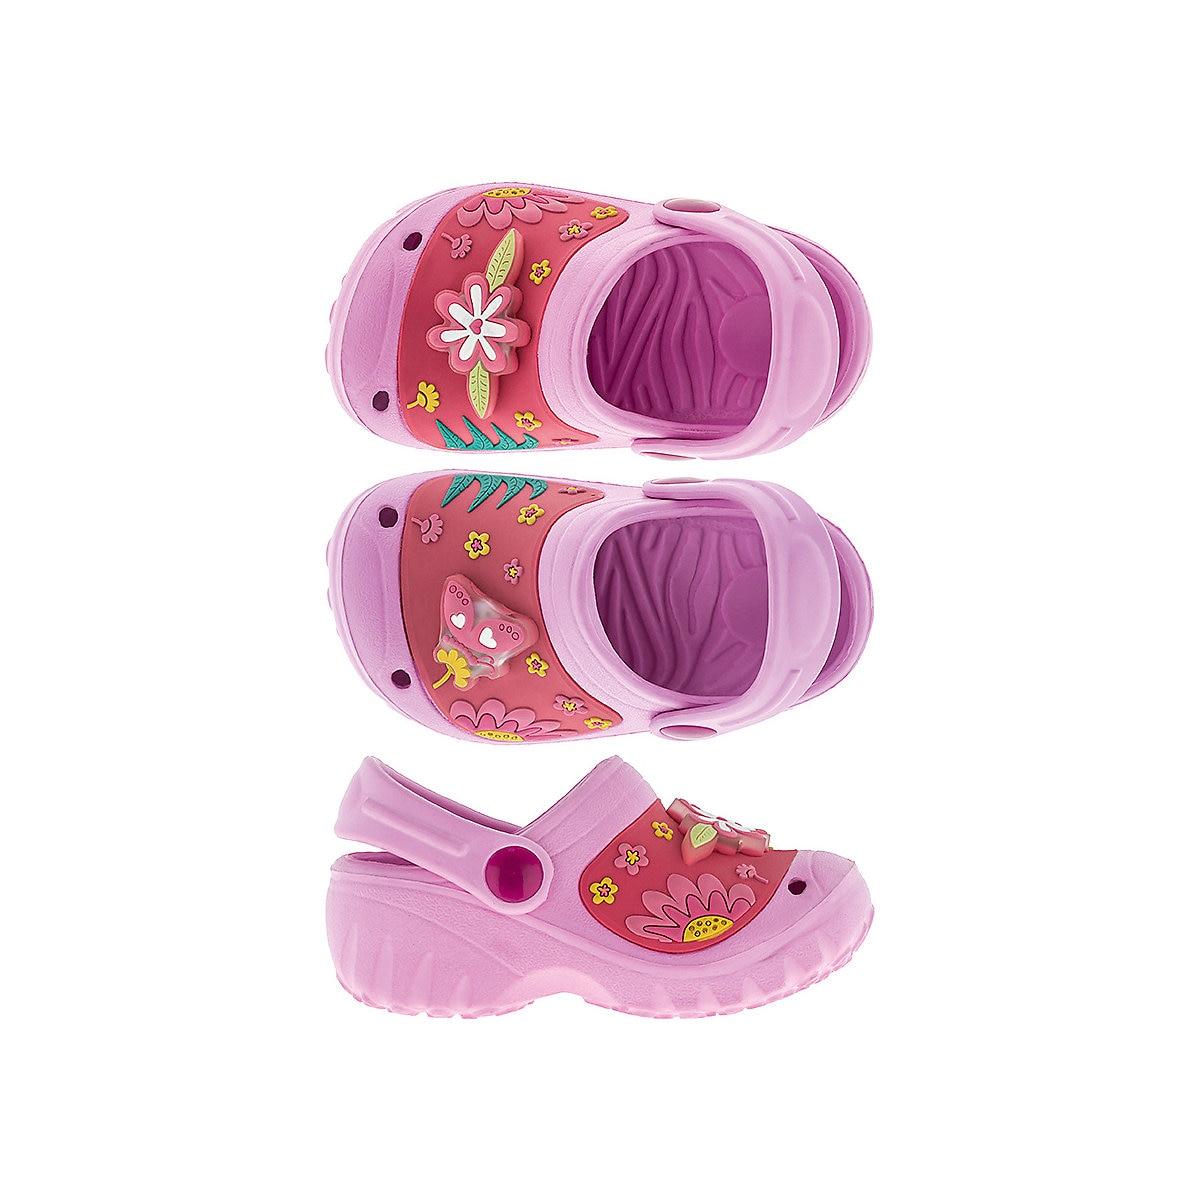 Фото - KAKADU Sandals 10696136 clogs comfortable and light children's shoes girls and boys women high heel shoes platform pumps woman thin high heels party wedding shoes ladies kitten heels plus size 34 40 41 42 43